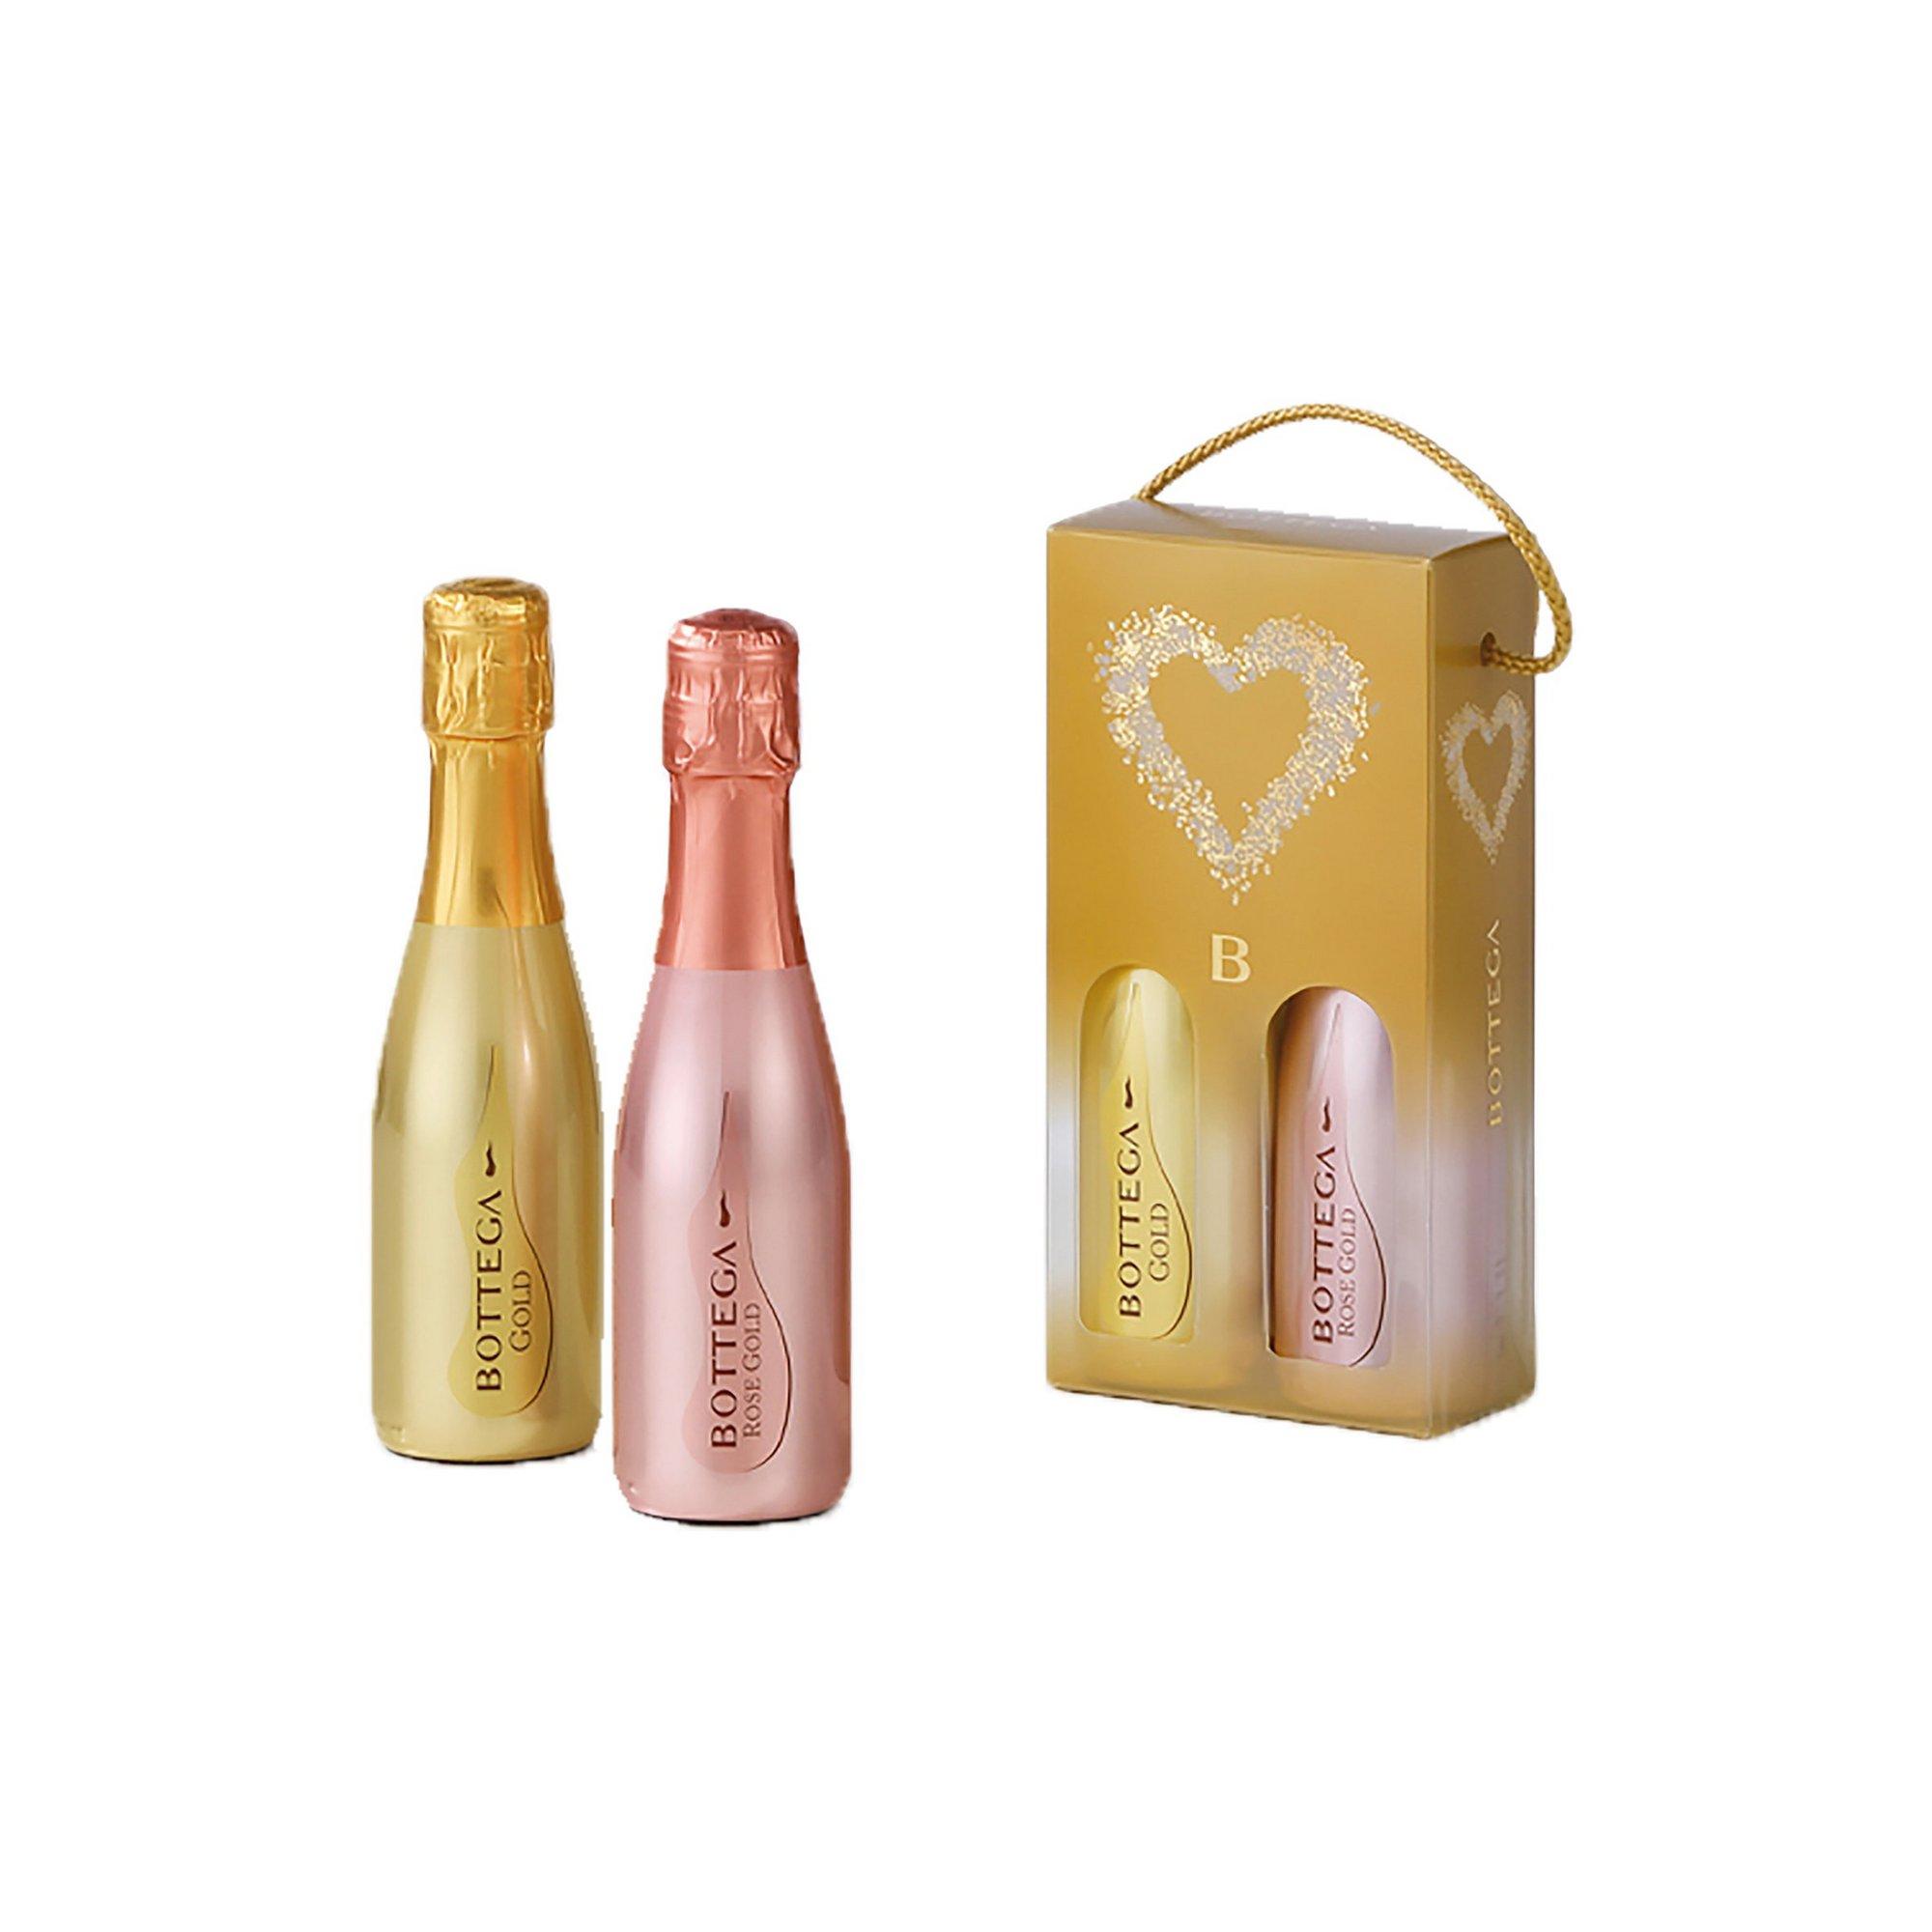 Image of Bottega 20cl Duo in Gift Box